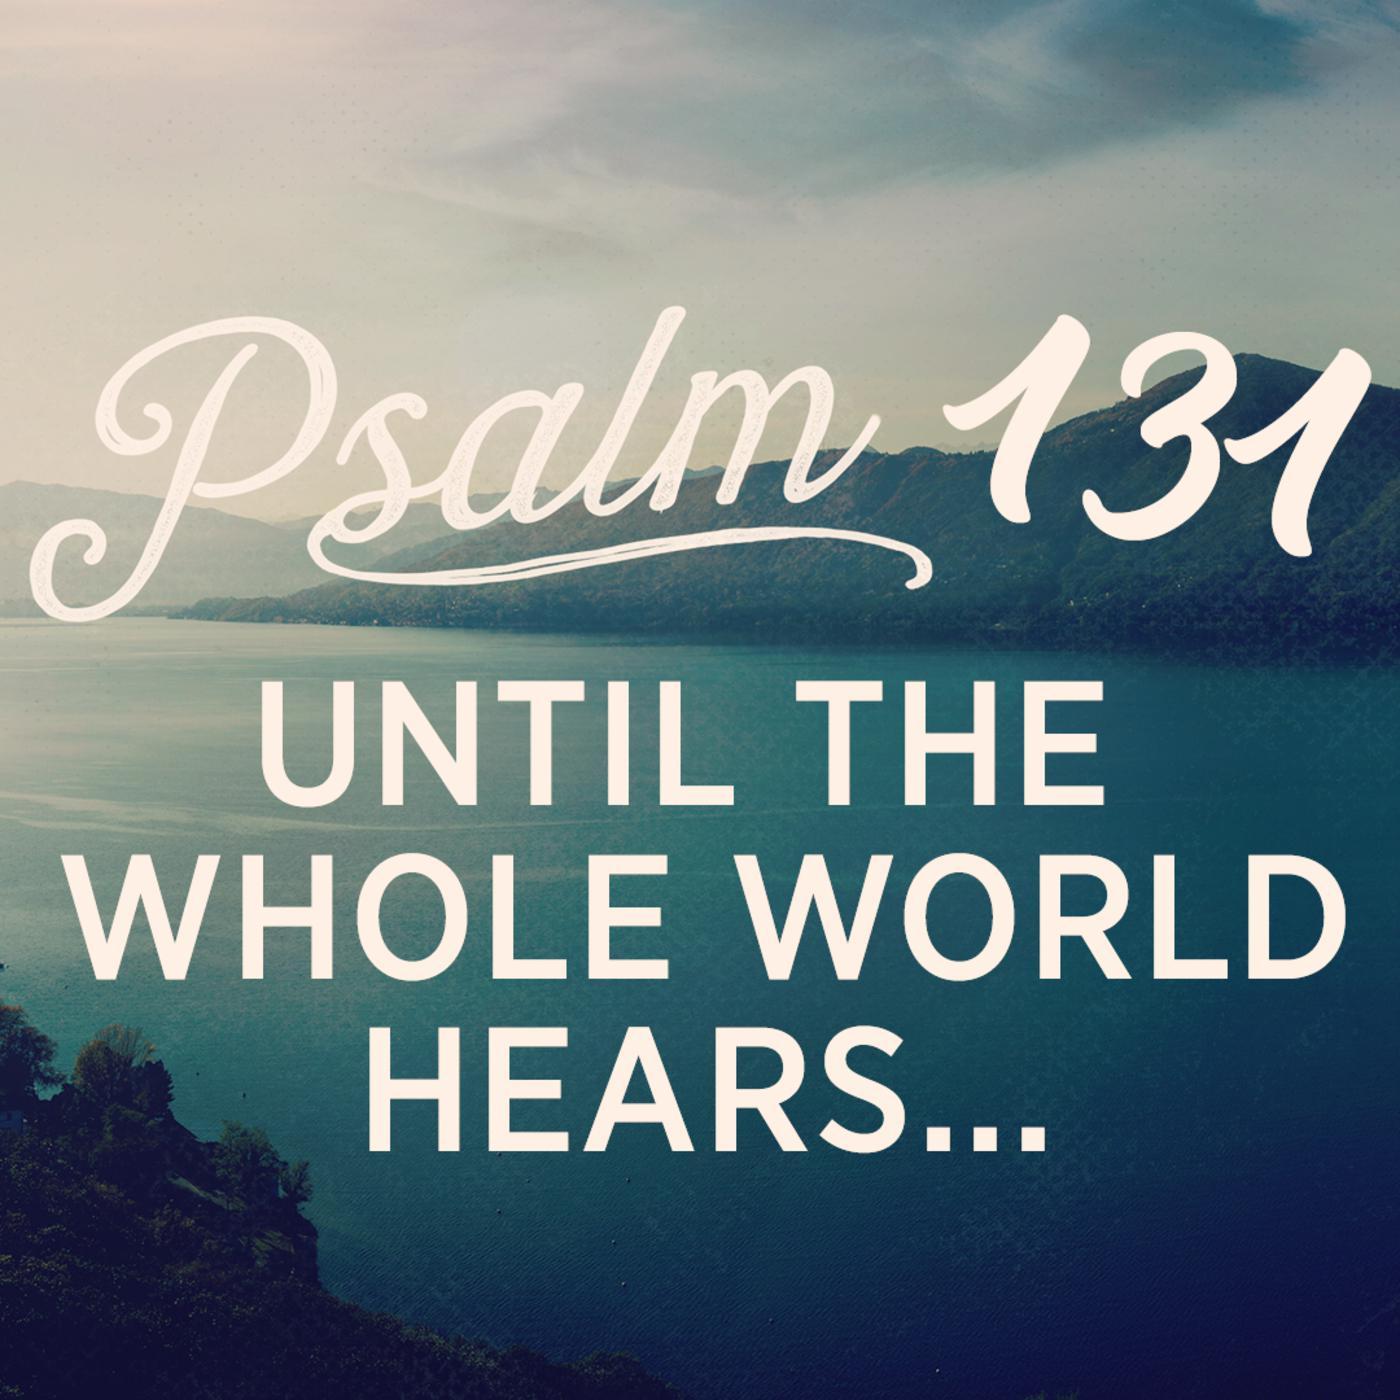 Until the whole world hears.jpg